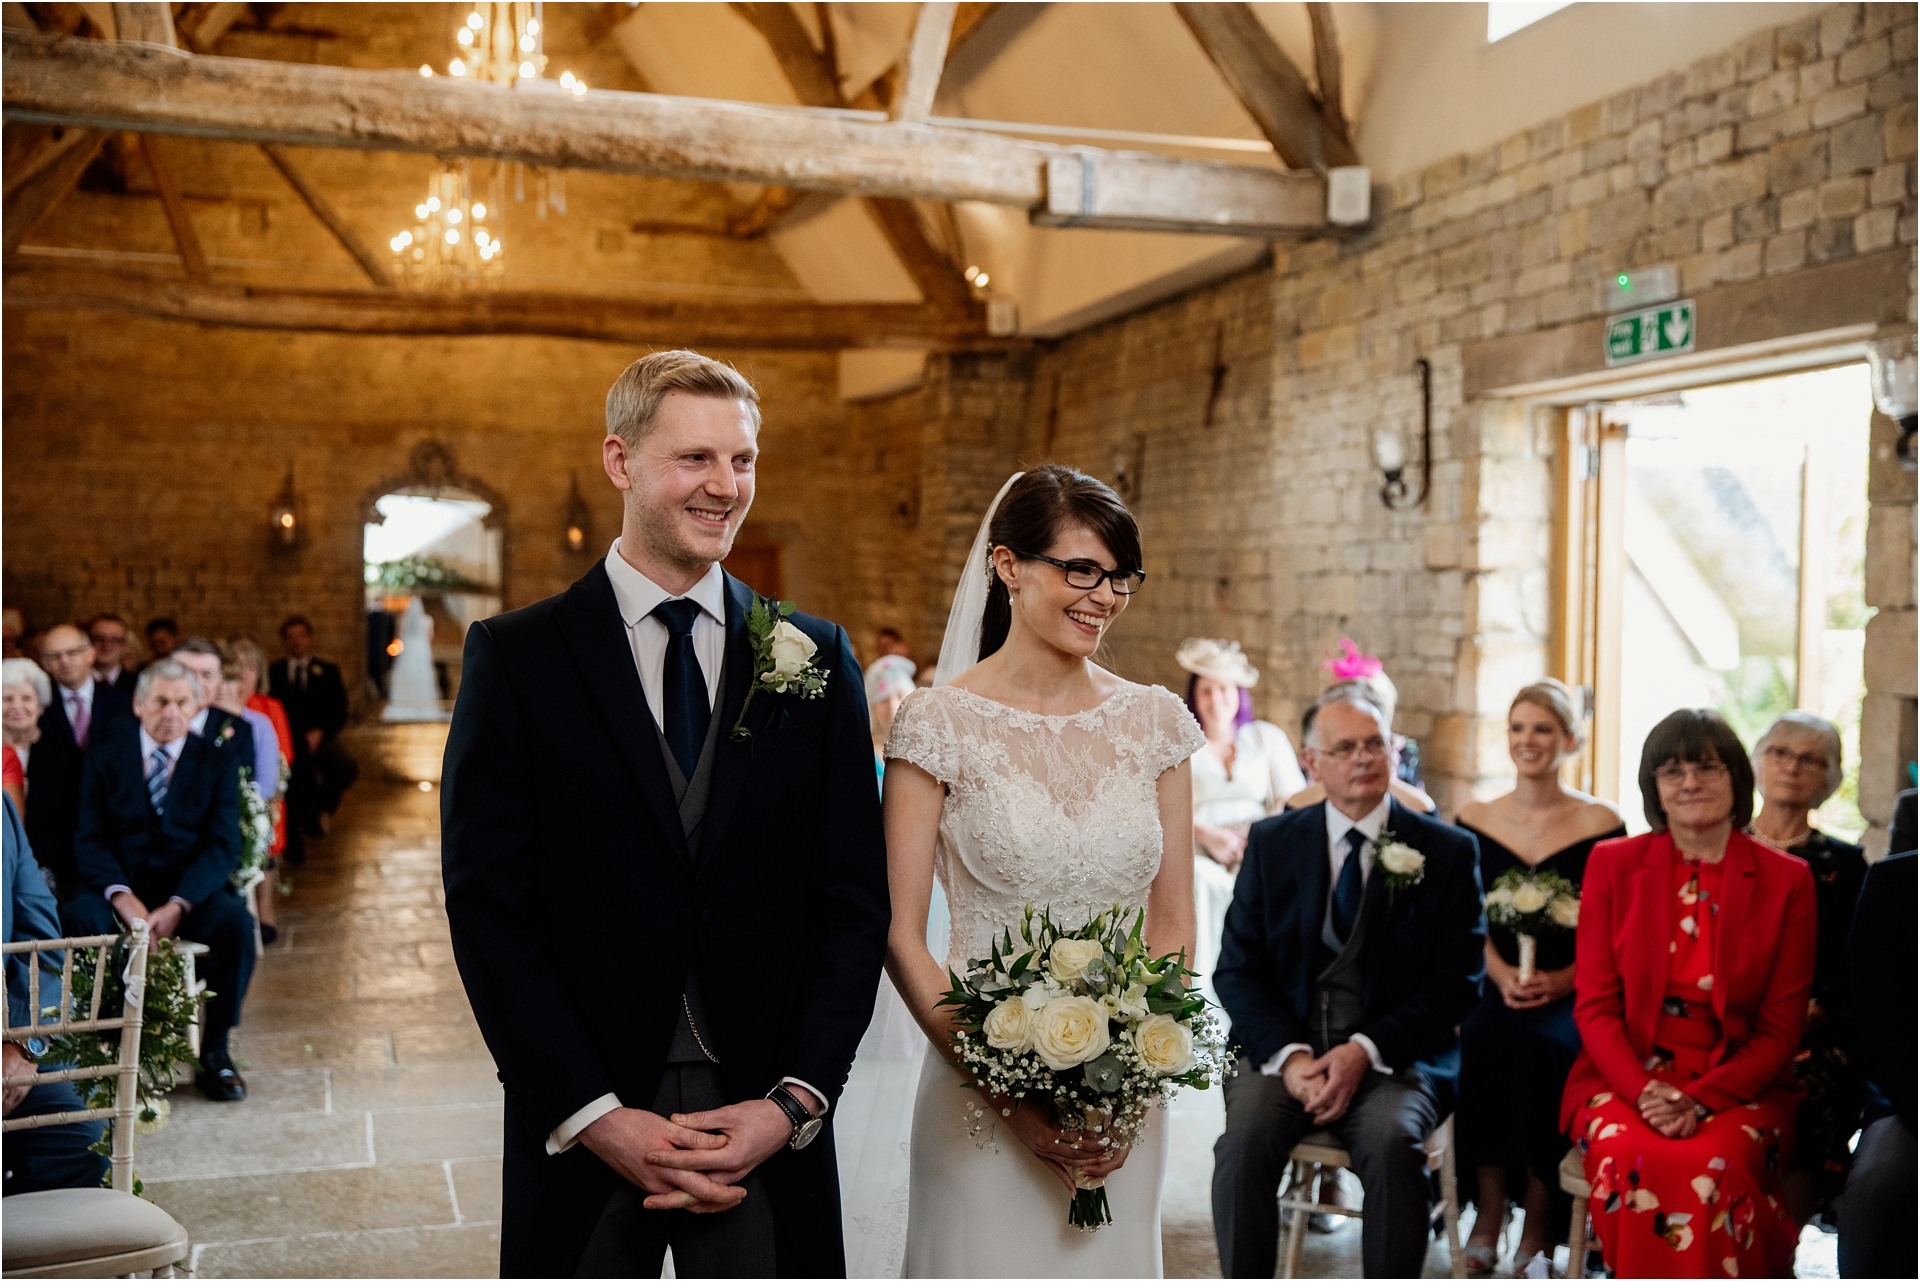 wedding ceremony at Blackwell Grange